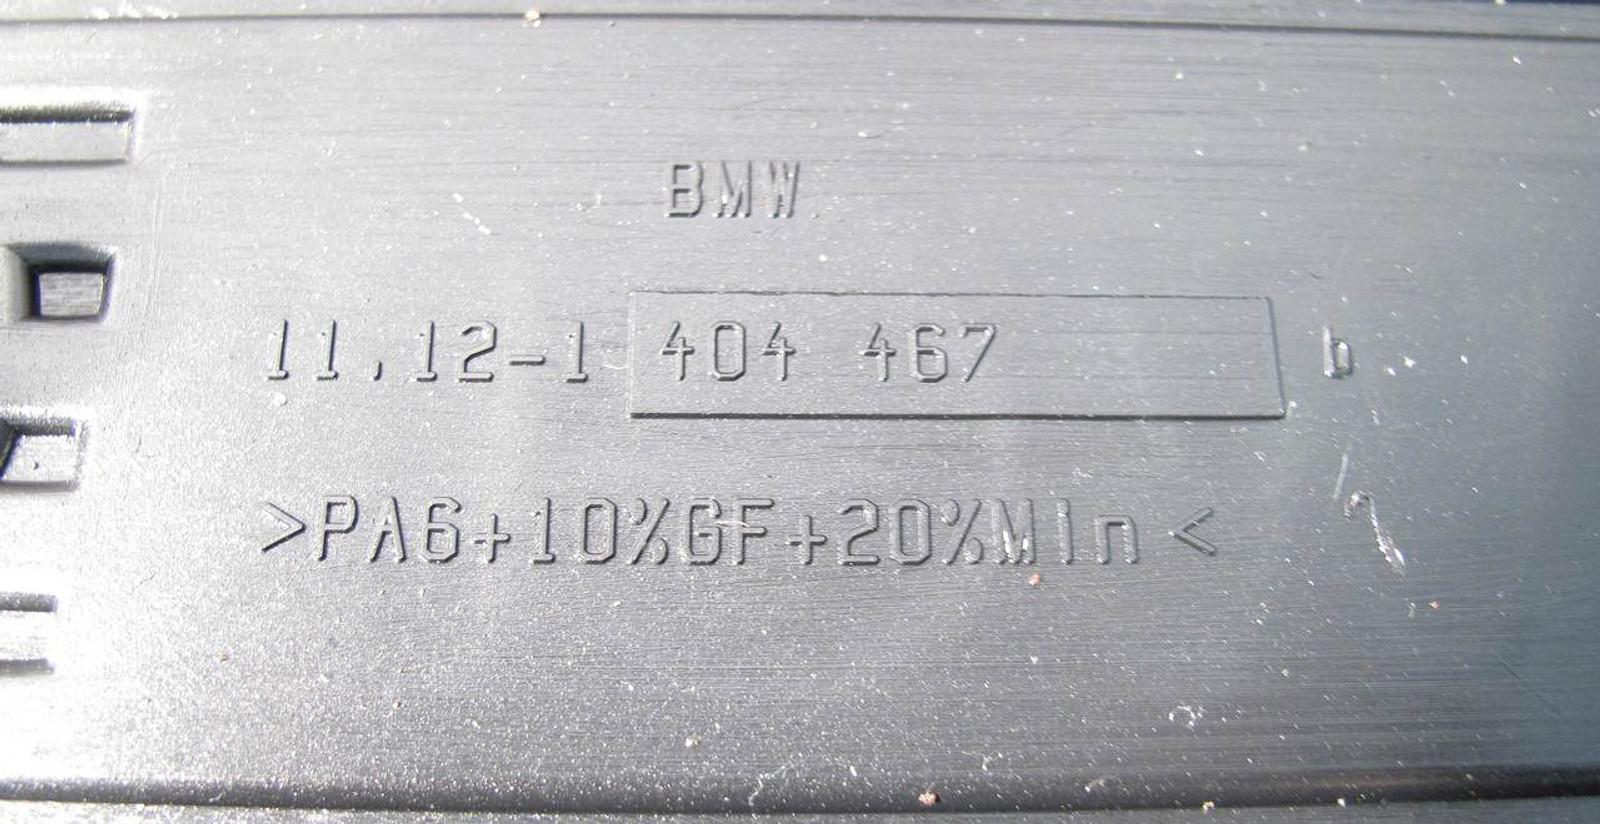 BMW S52 Plastic Engine Cover M-Power 1996-2000 E36 M3 3 2 Z3 M3 2 USED OEM